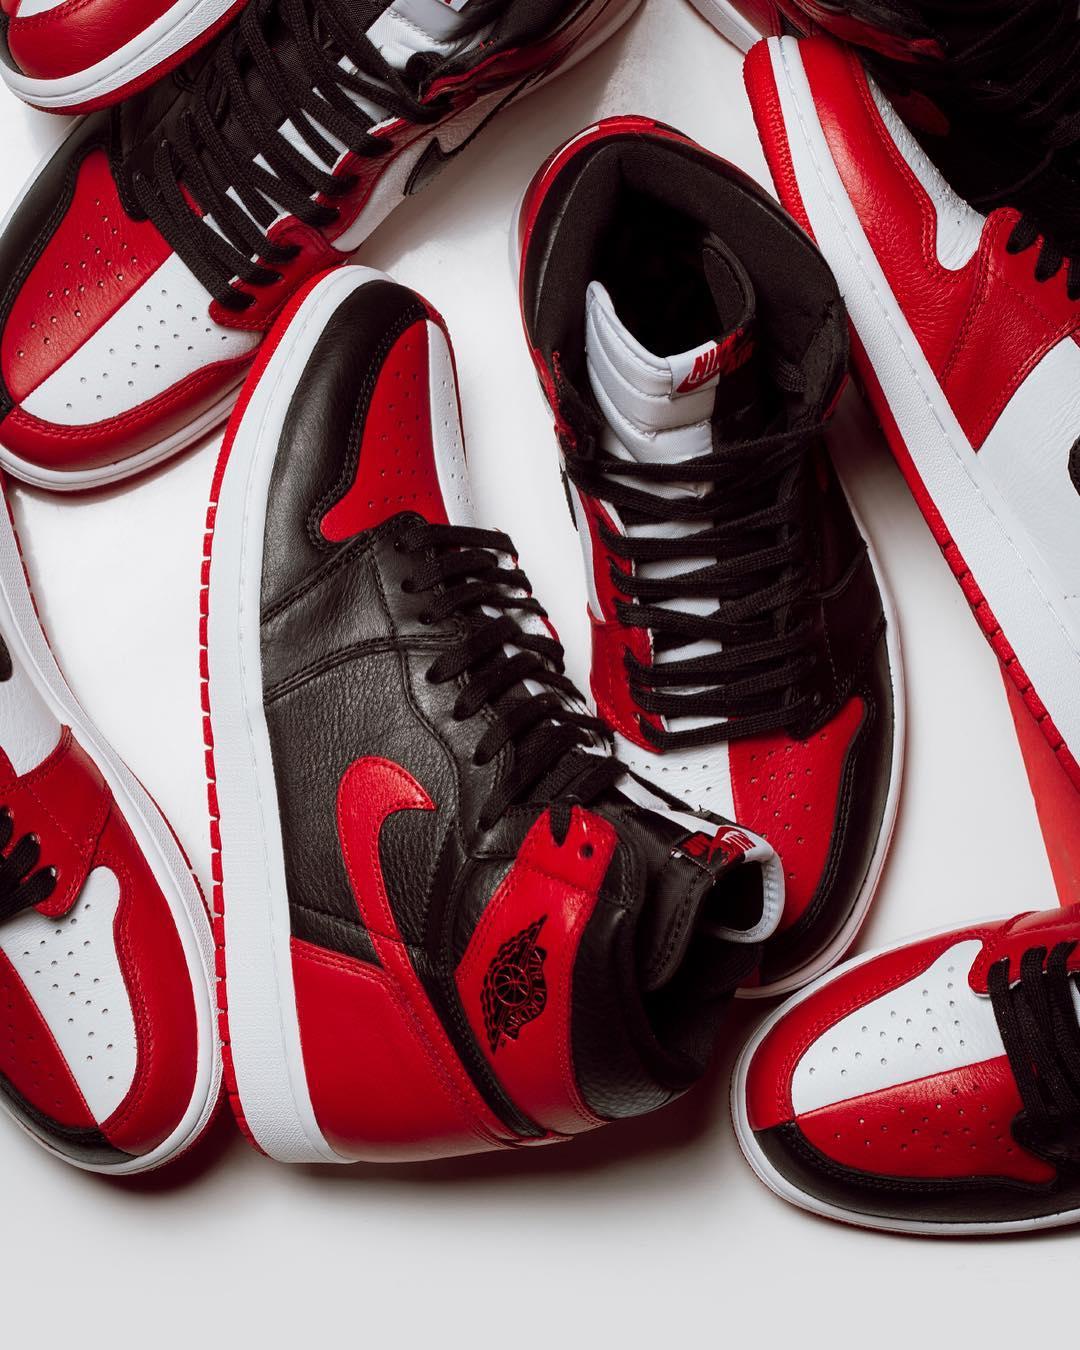 Air Jordan 1,AJ1,Homage To Hom  本周重磅降临!鸳鸯 Air Jordan 1 明早官网上架